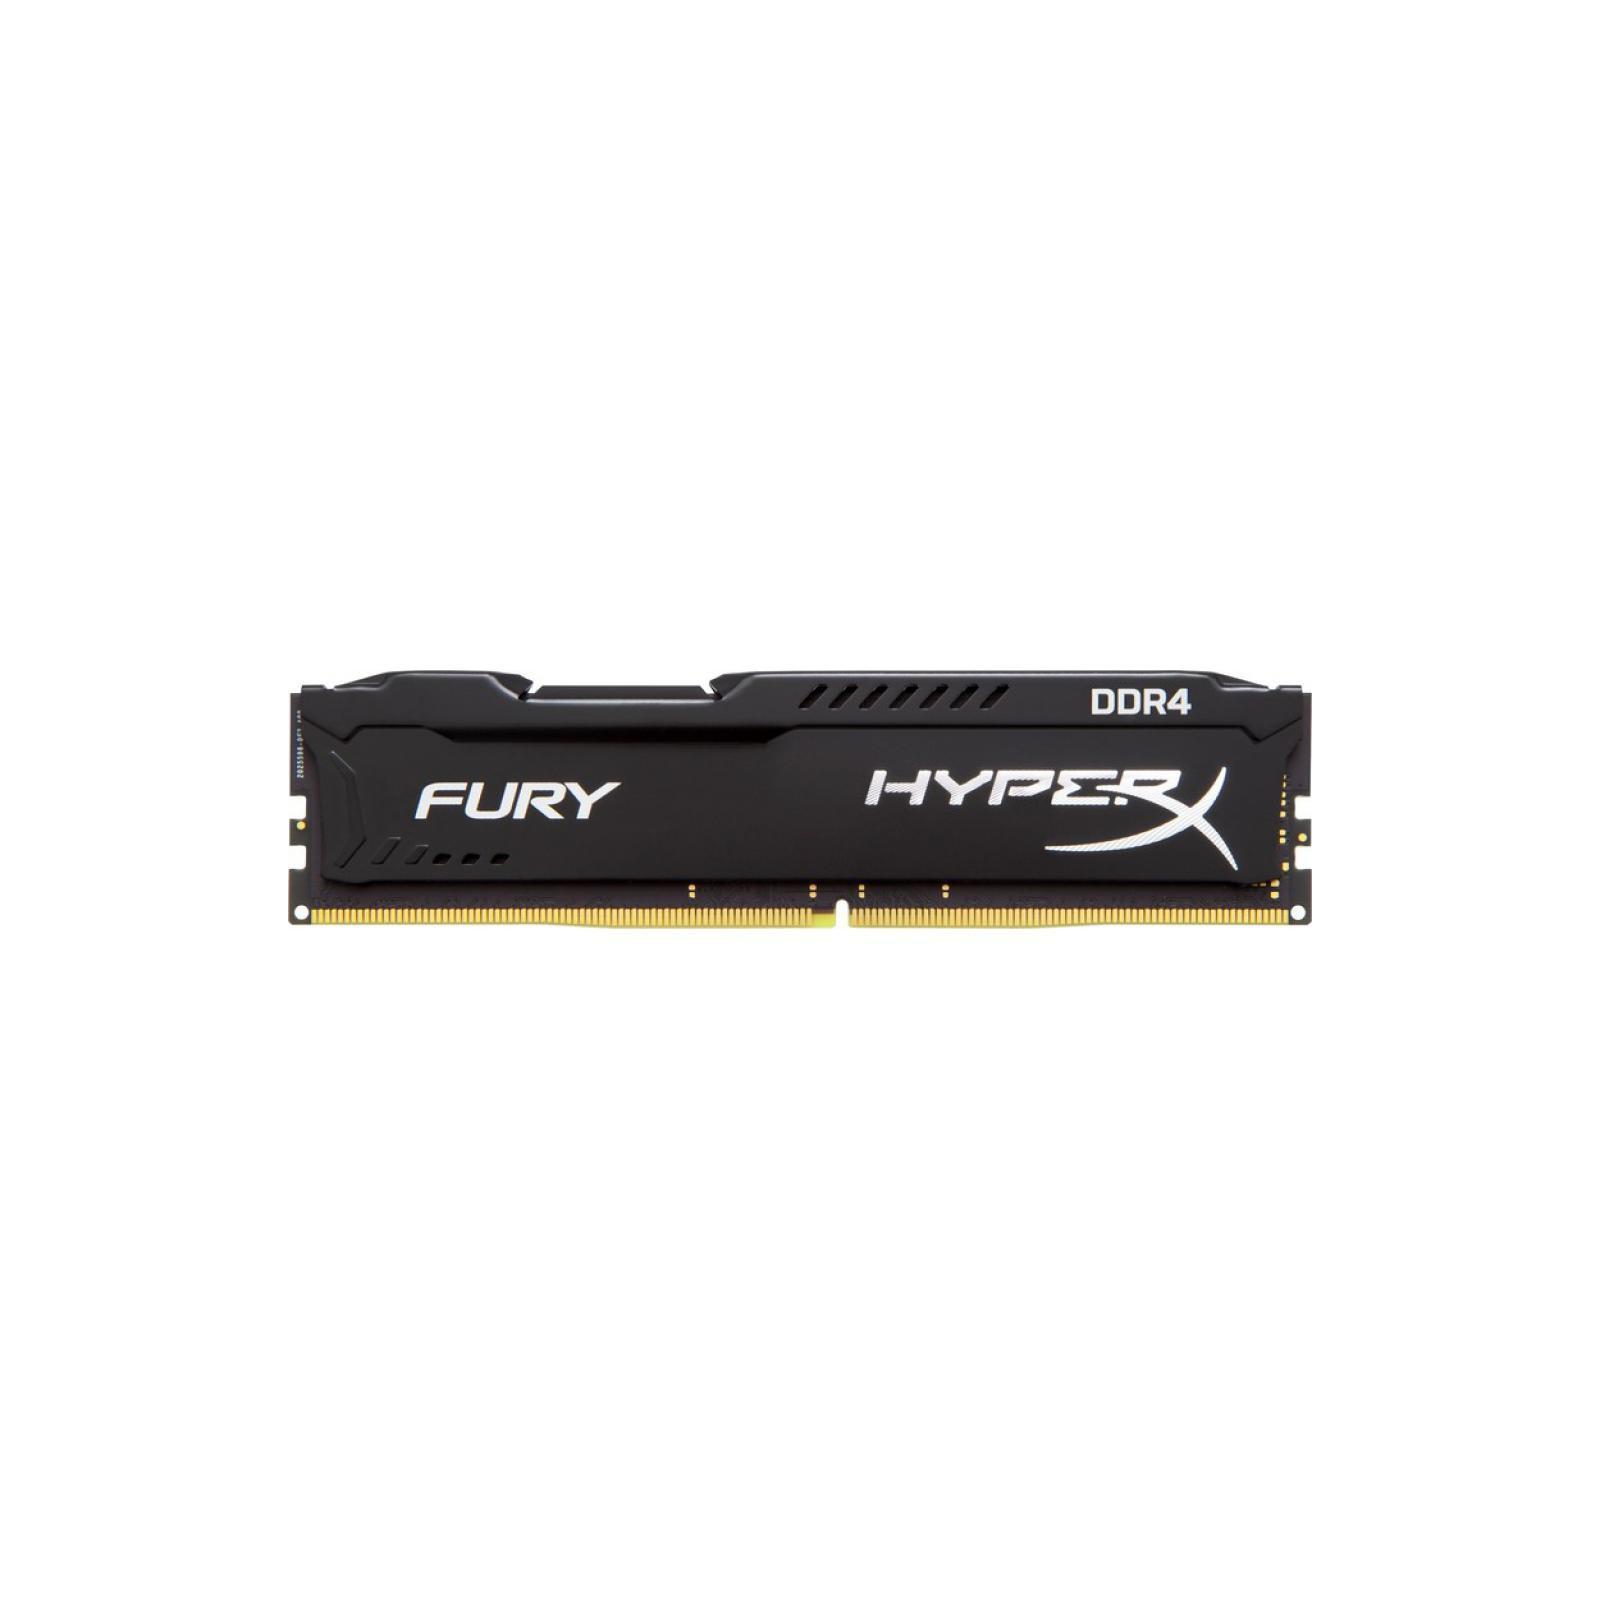 Модуль памяти для компьютера DDR4 16GB 3200 MHz HyperX FURY Black HyperX (Kingston Fury) (HX432C18FB/16)